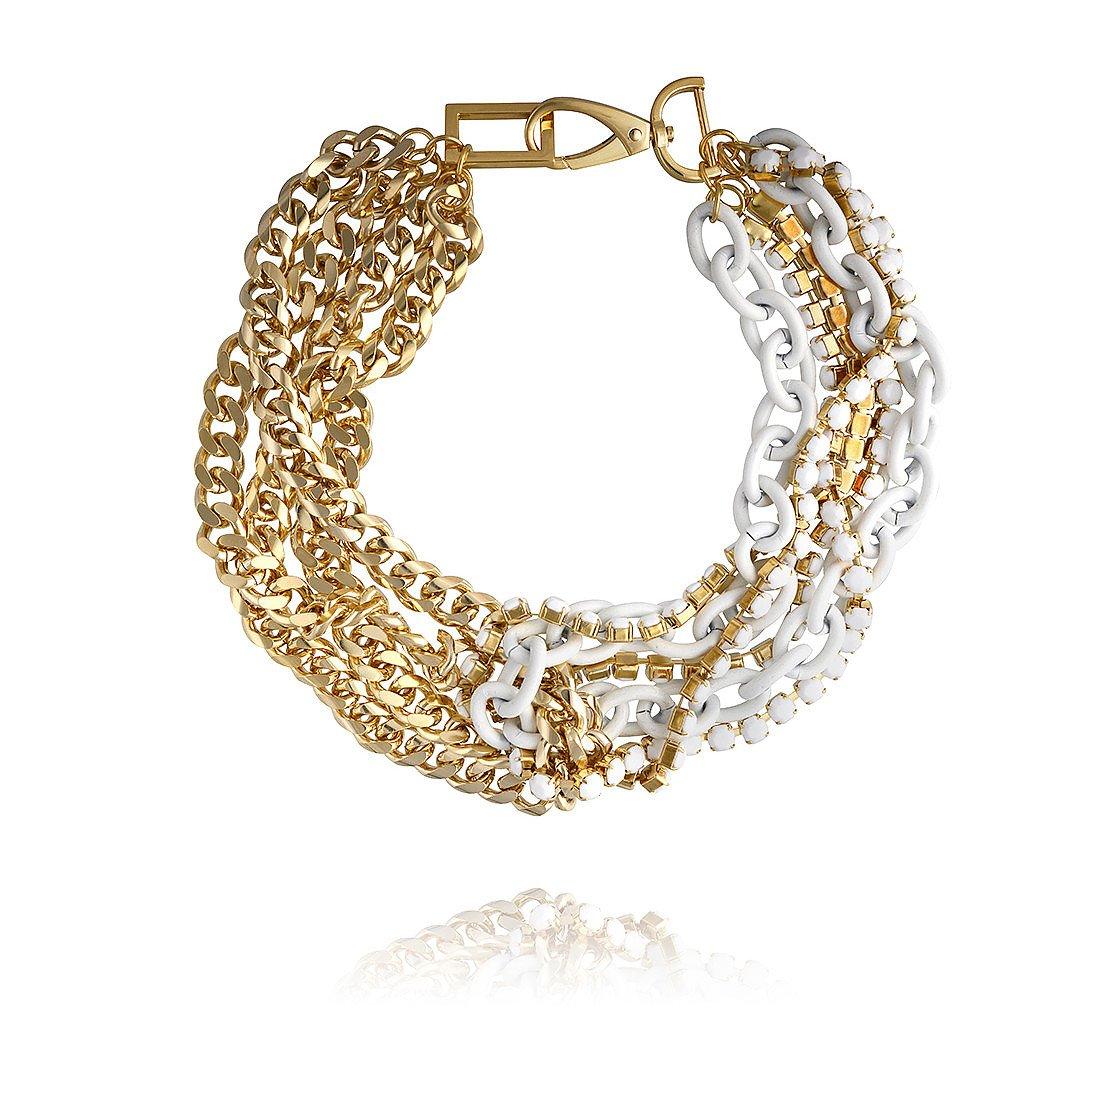 Fenton Twist Collar Necklace